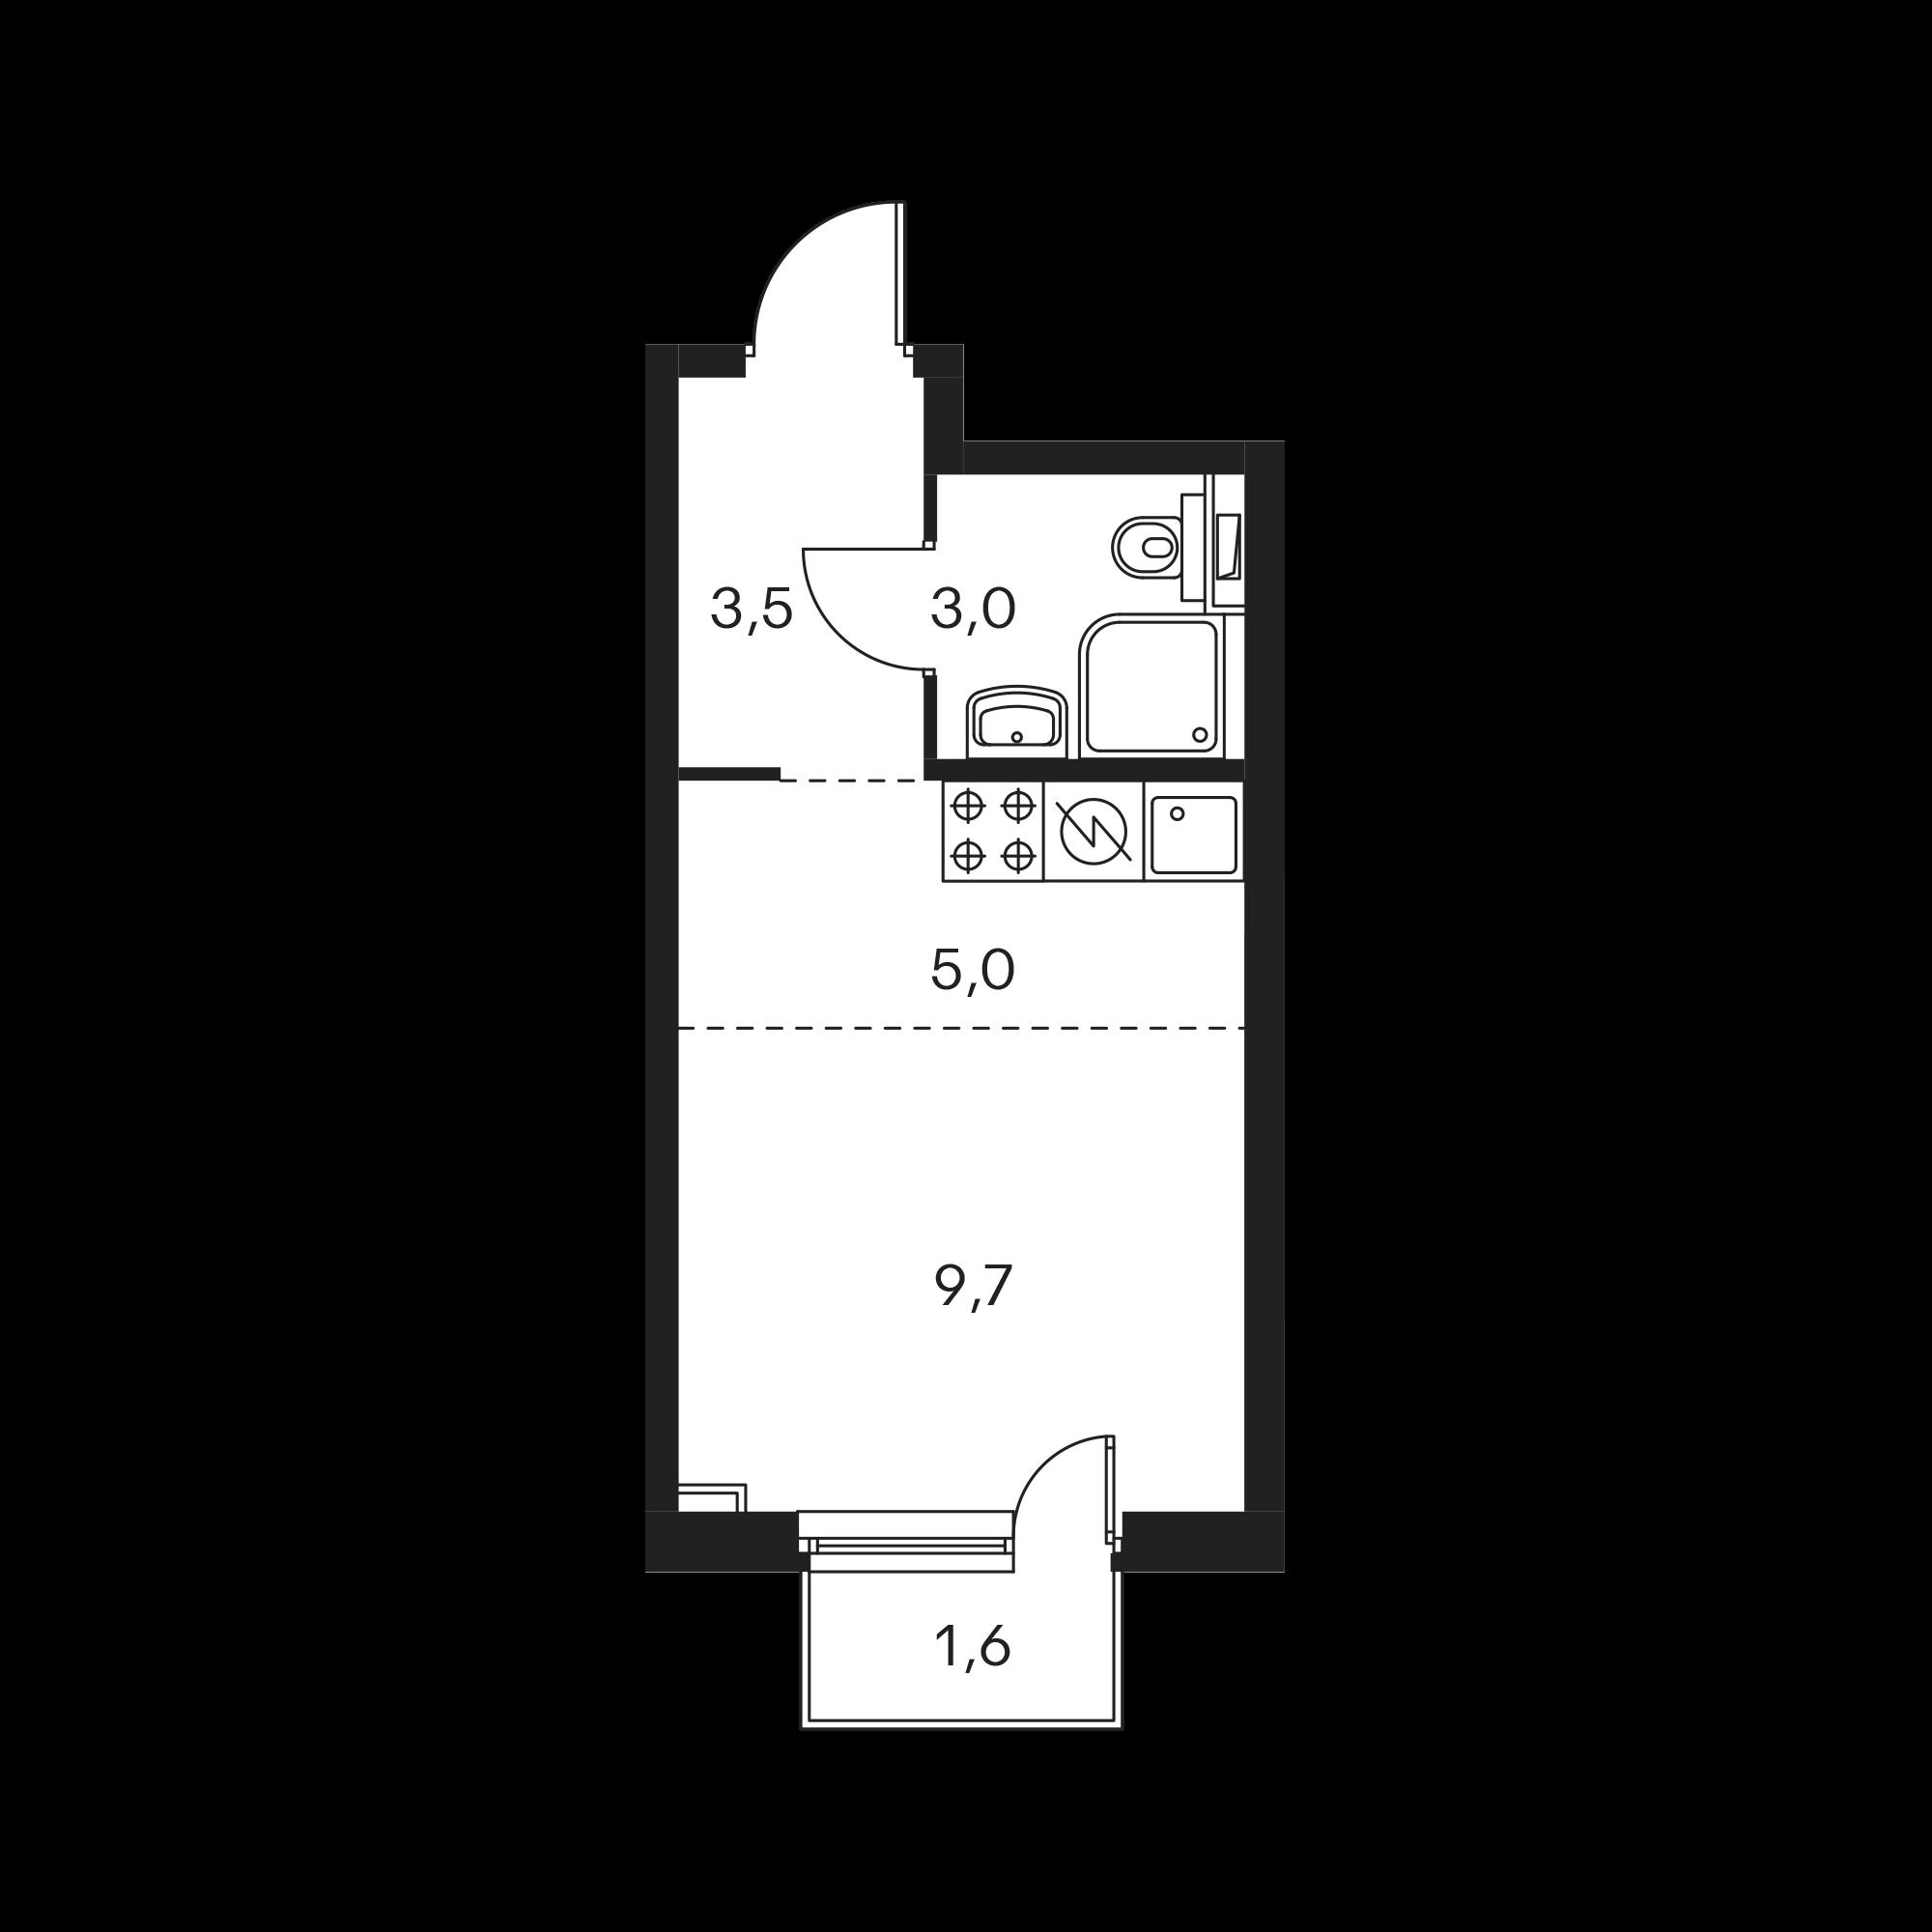 1NS1_3.6-1B